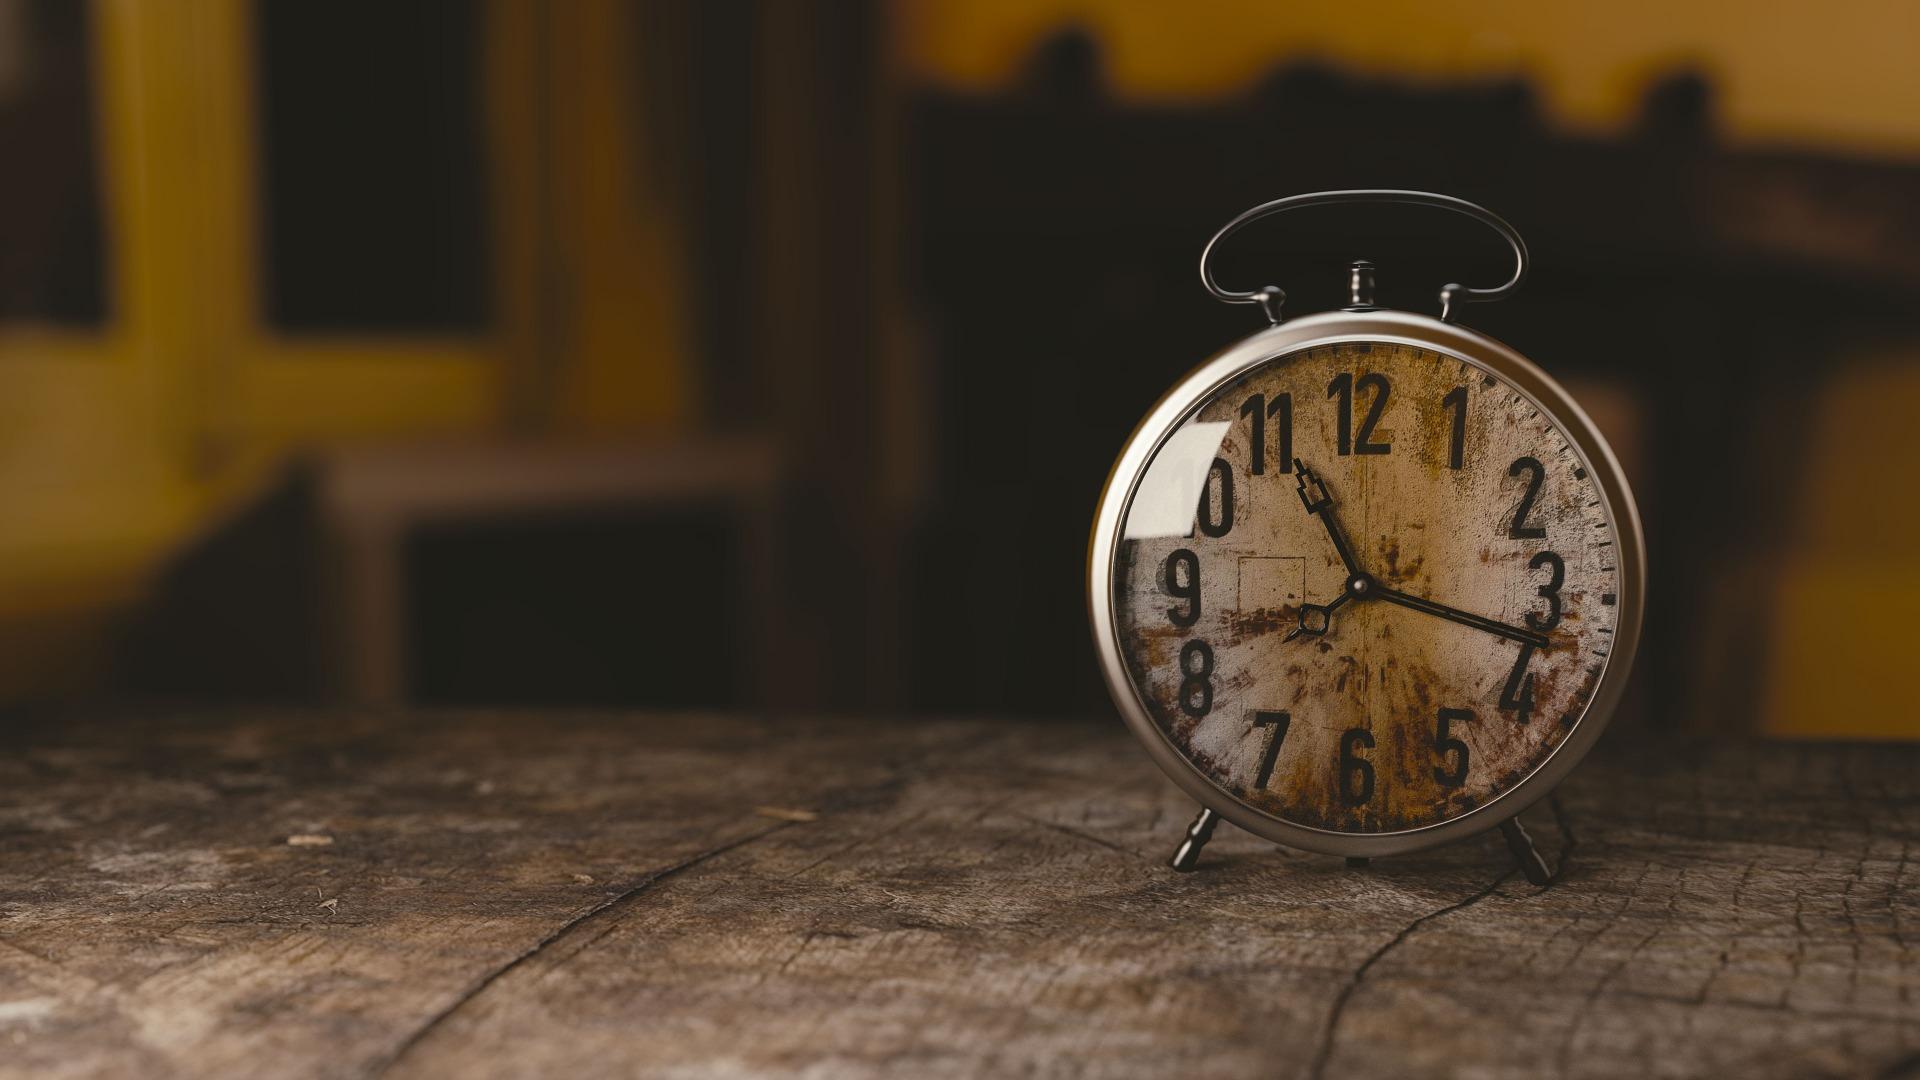 Uhr, Wecker, Zeit, Alarm, Stunden, alt, Jahrgang - Wallpaper HD - Prof.-falken.com